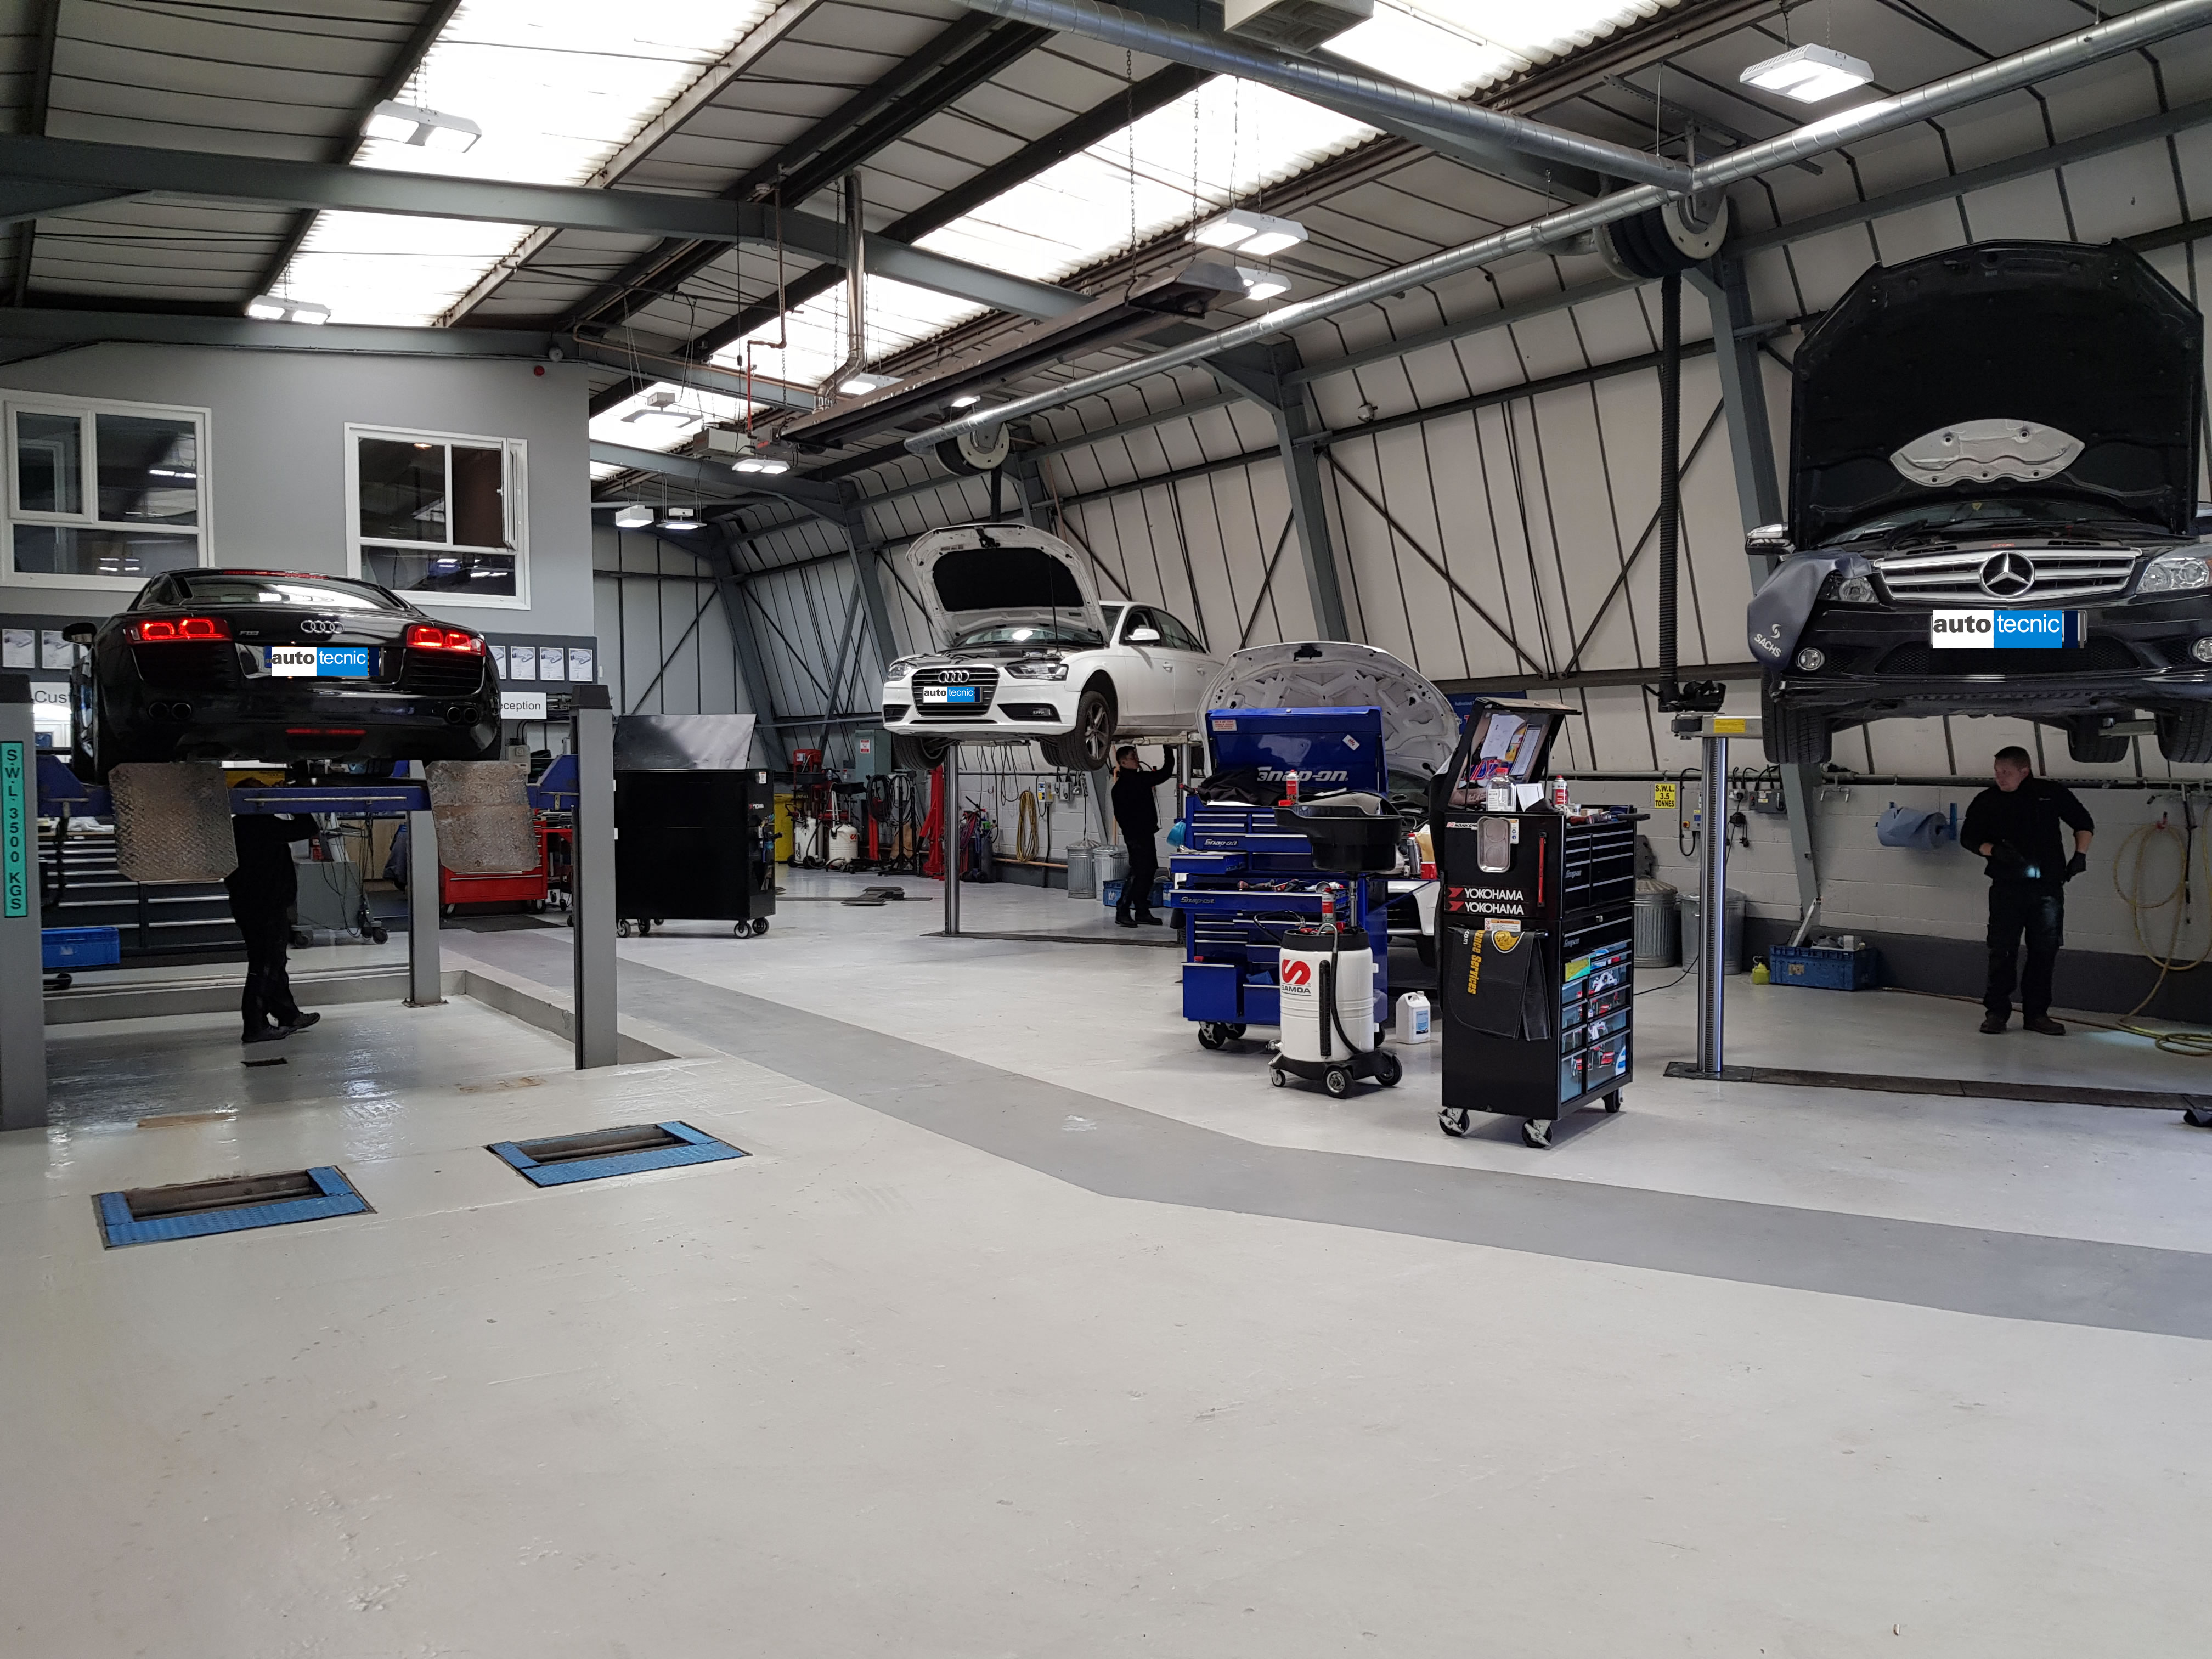 autotecnic - Sheffield - Audi - Mercedes